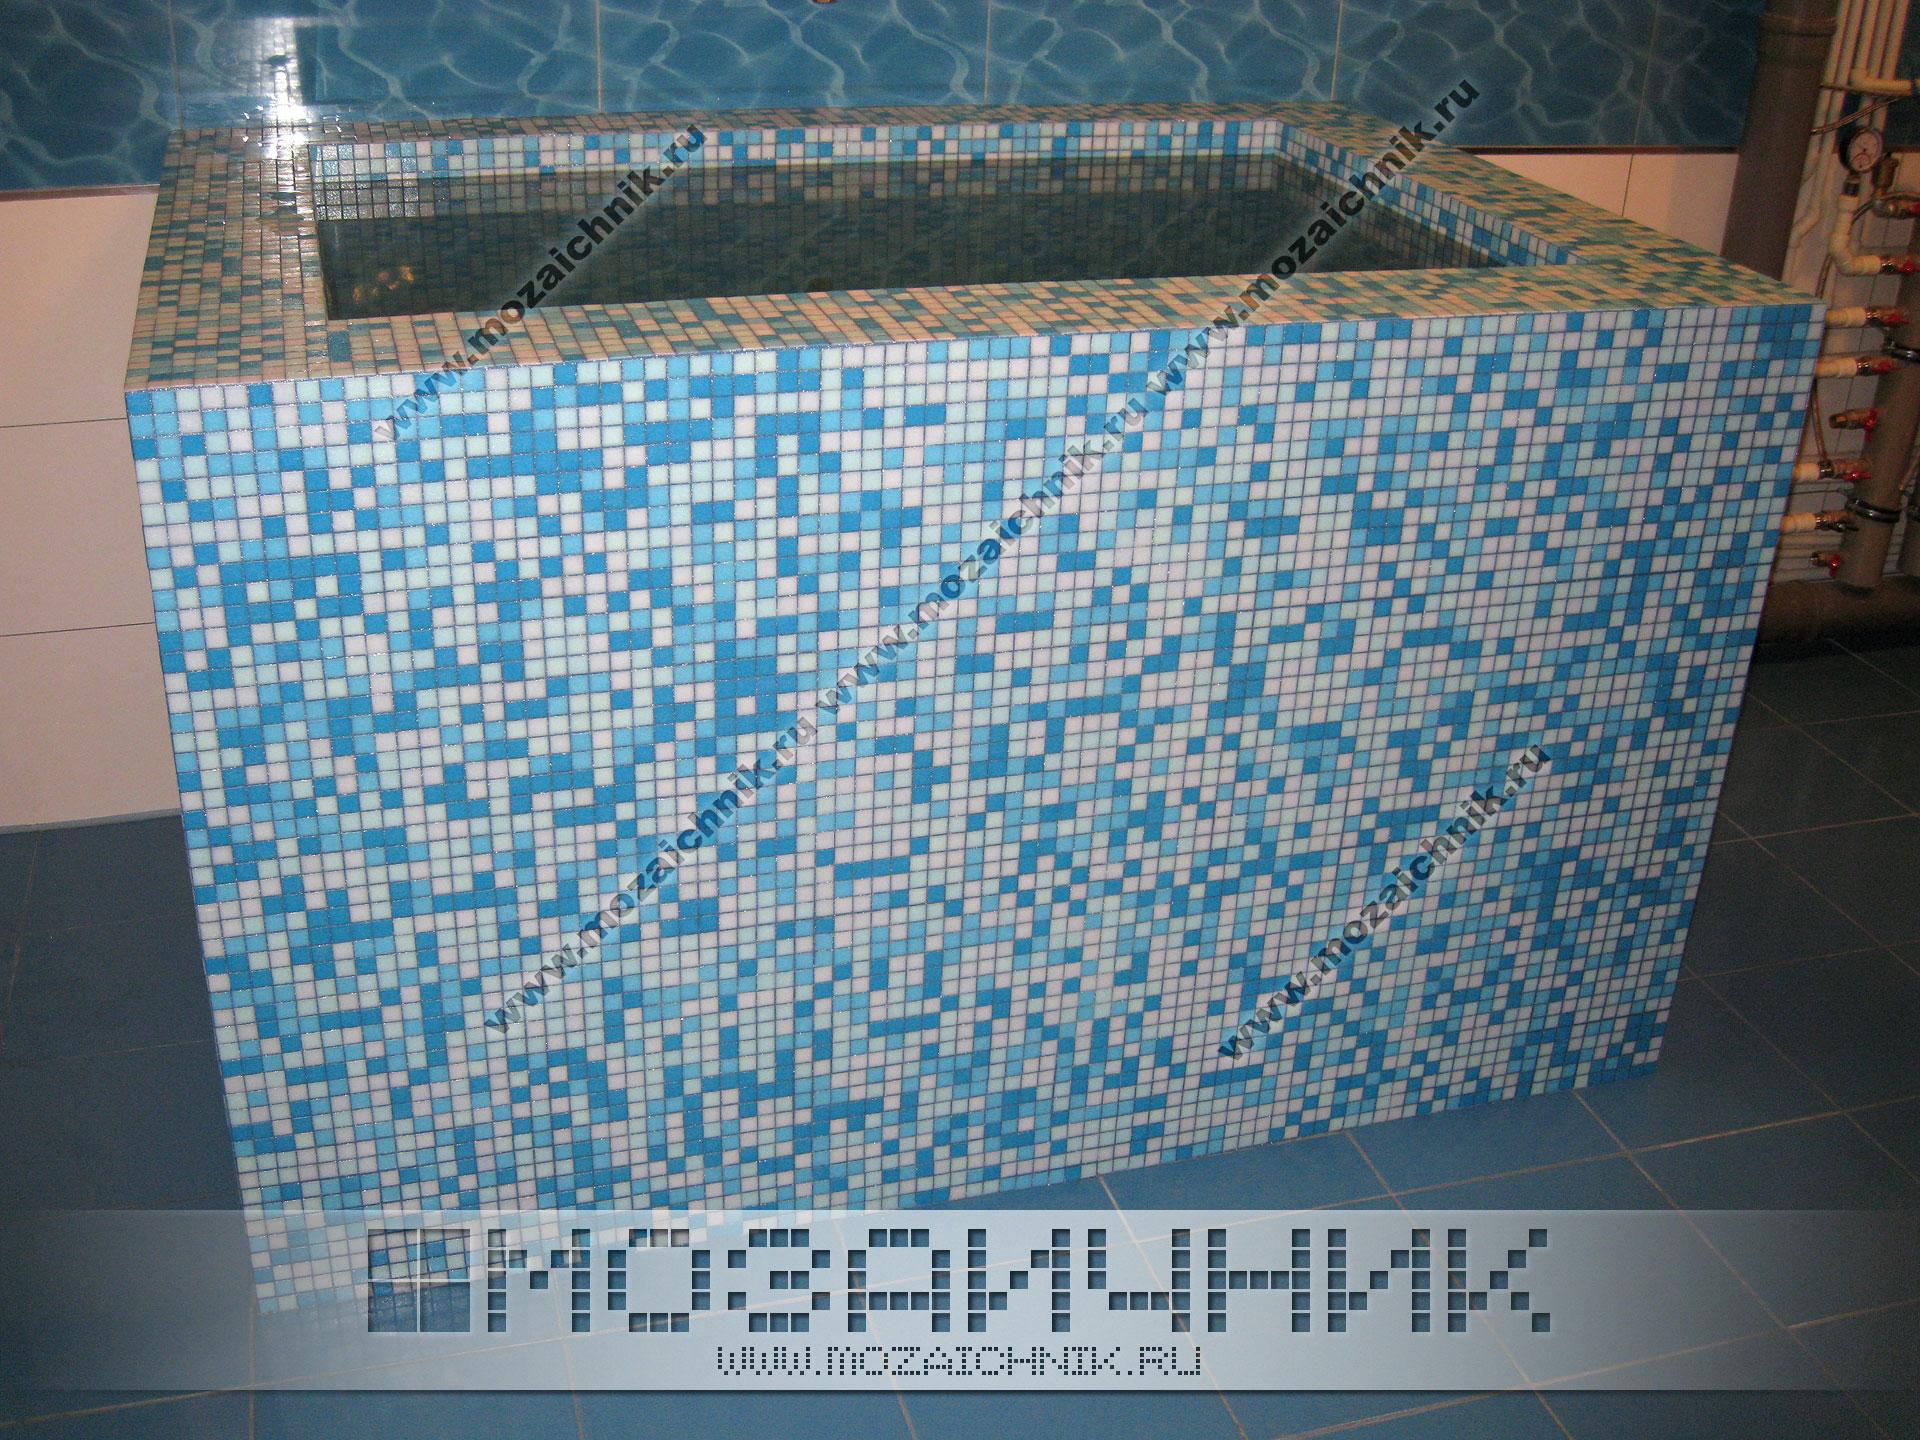 Отделка стен бассейна